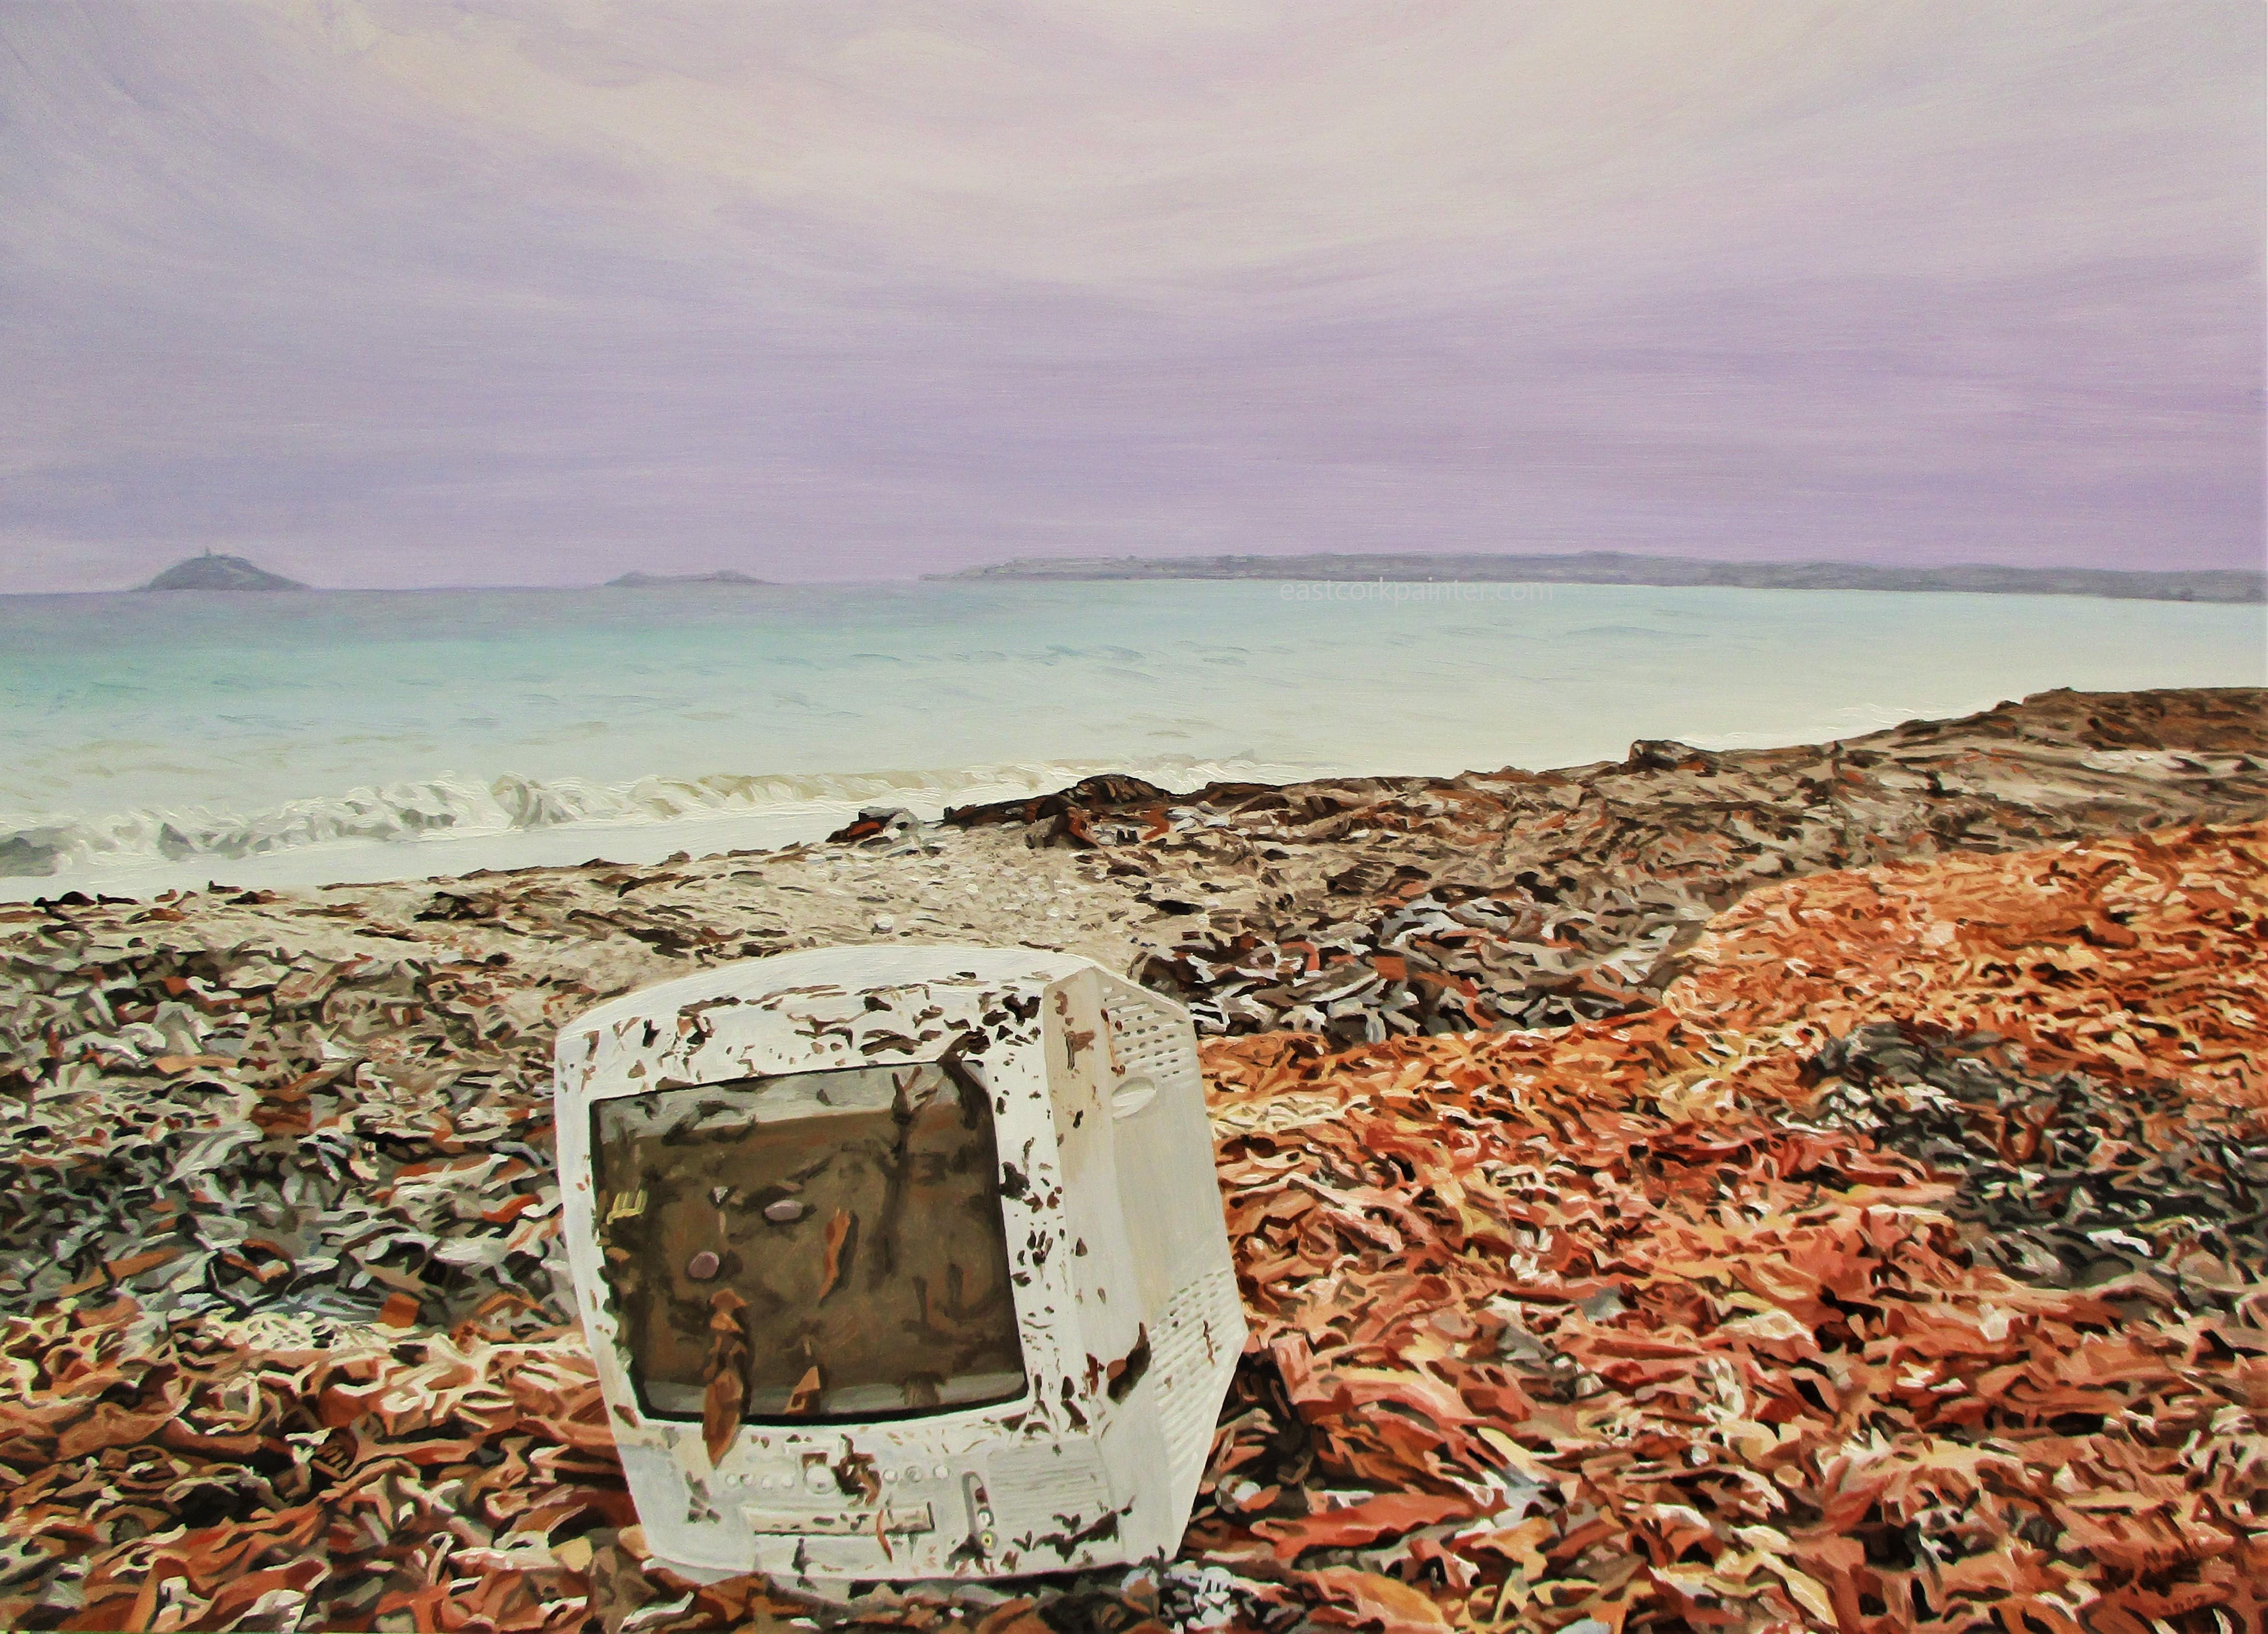 Computer On Garryvoe Beach watermark